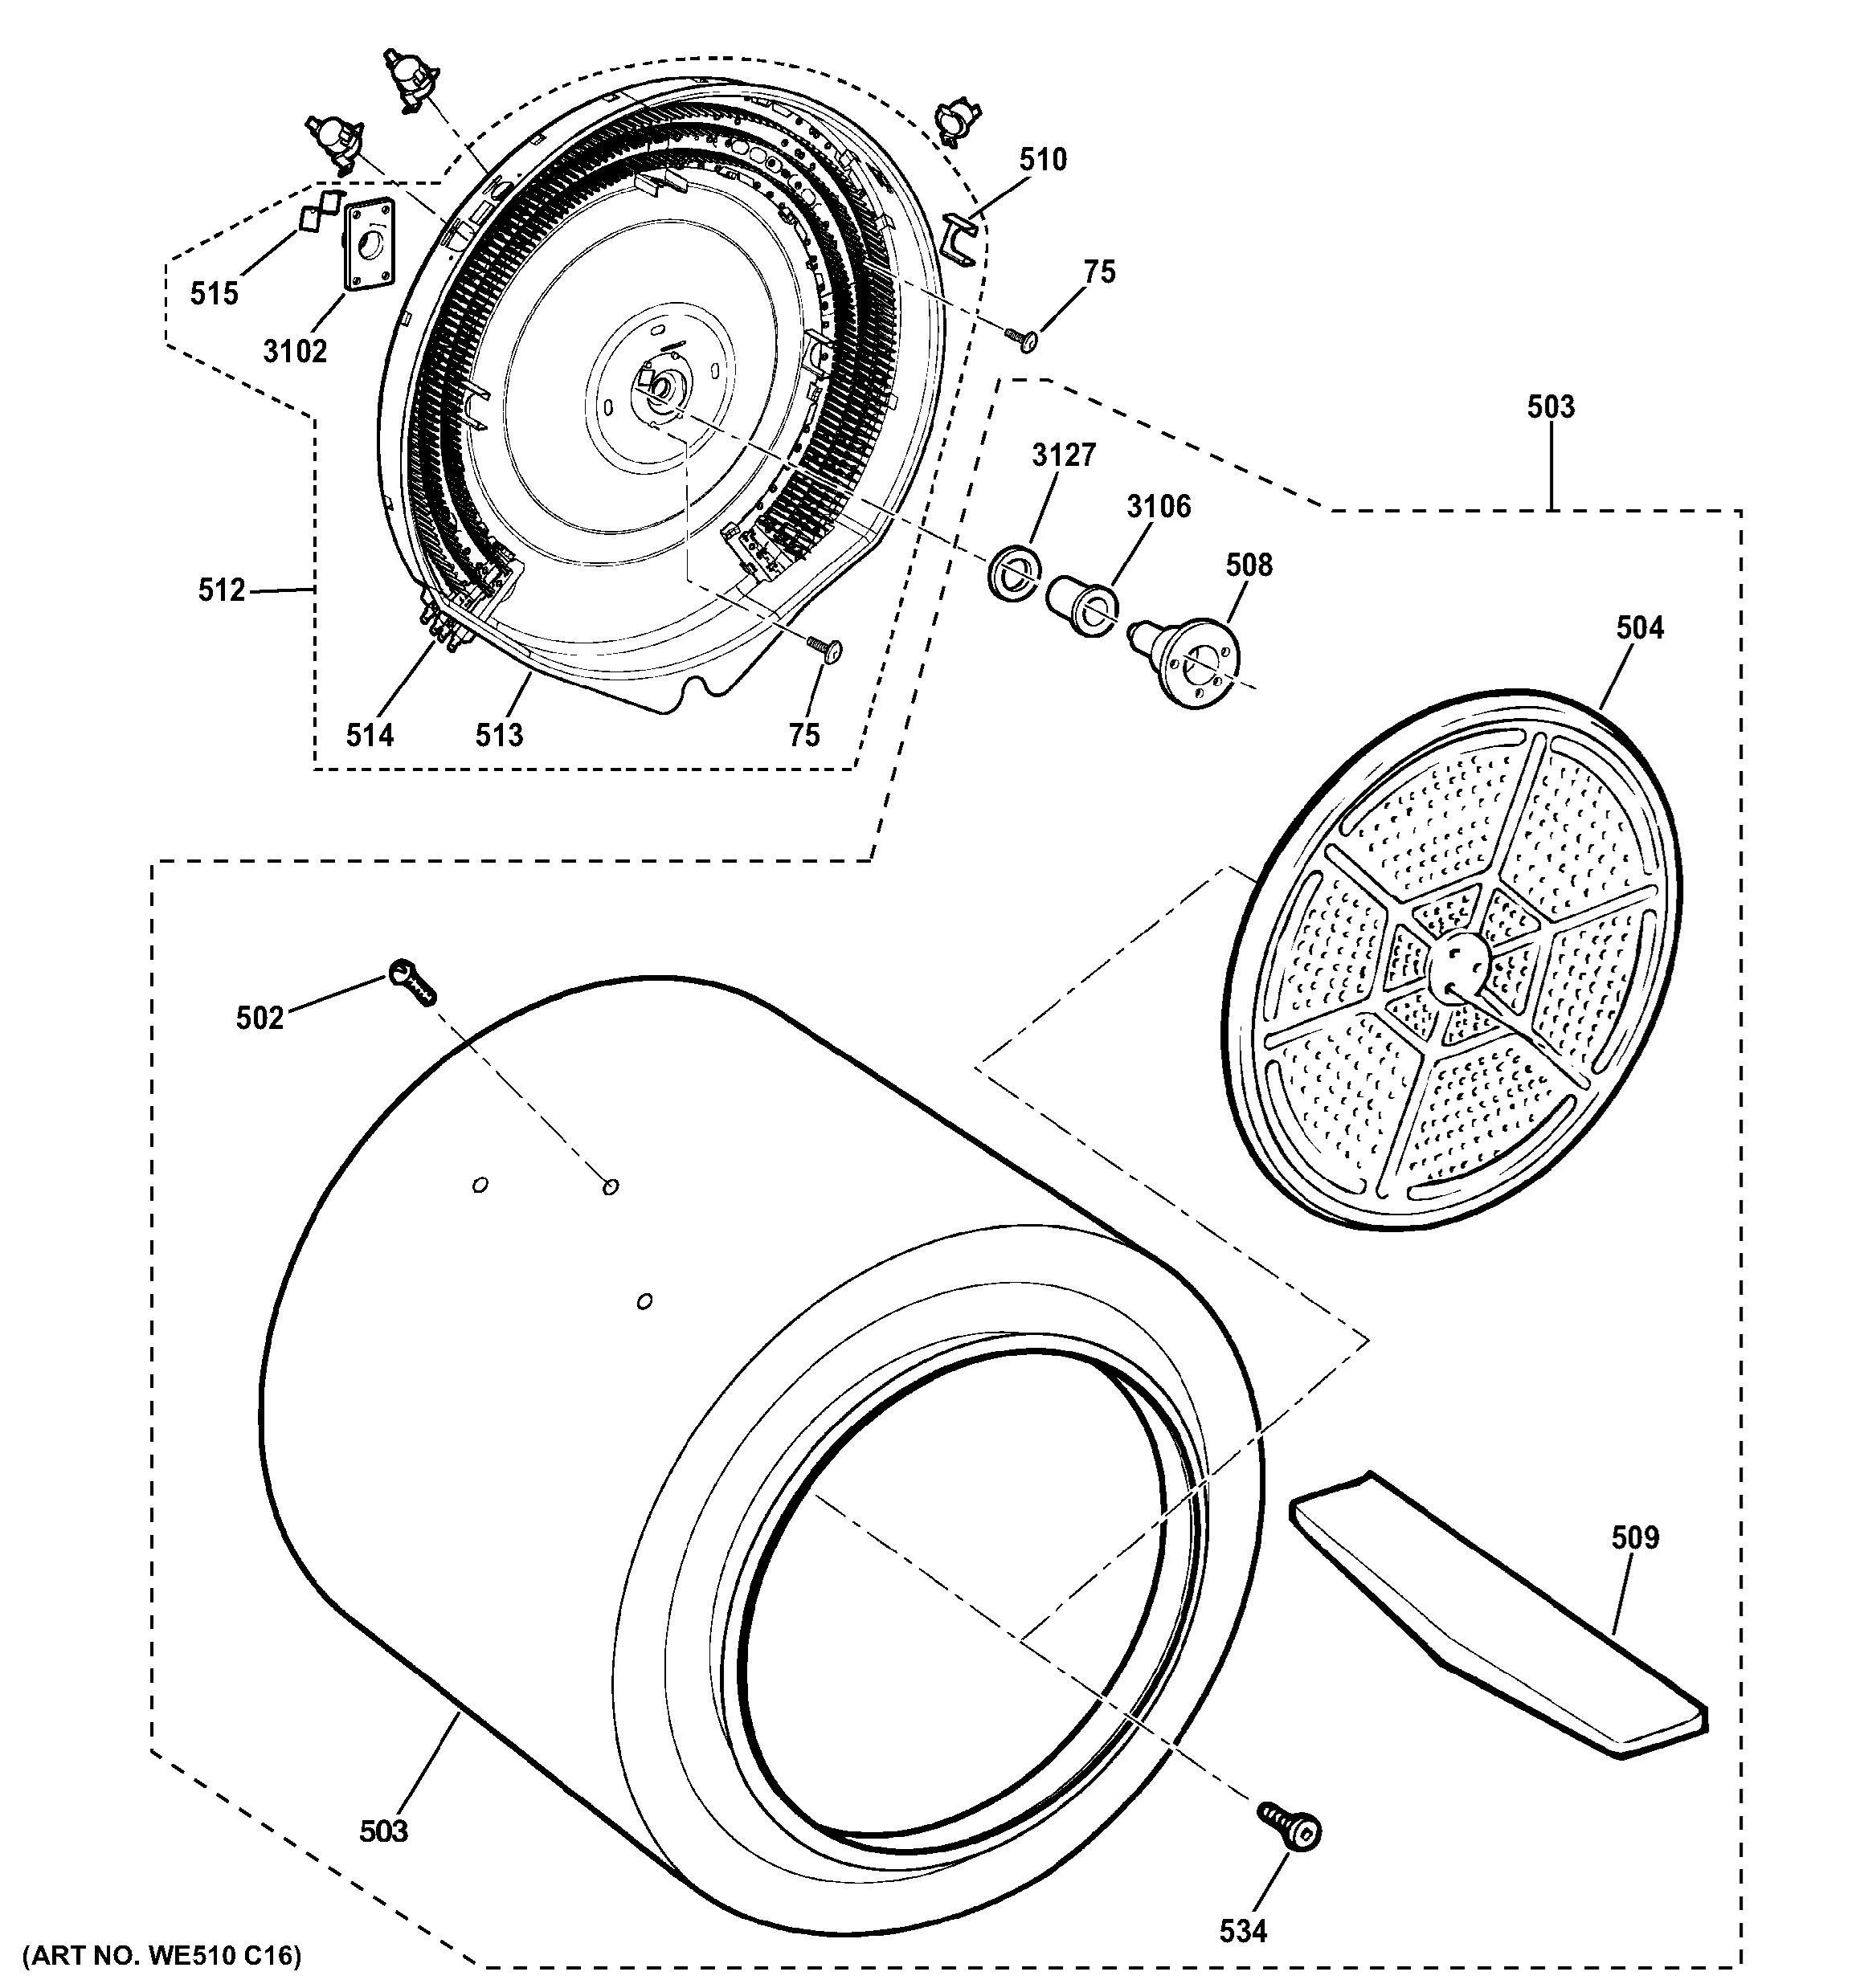 Dryer Timer Model M460 G Wiring Diy Enthusiasts Diagrams Frigidaire Hotpoint Schematic Estate Diagram Elsalvadorla Amana